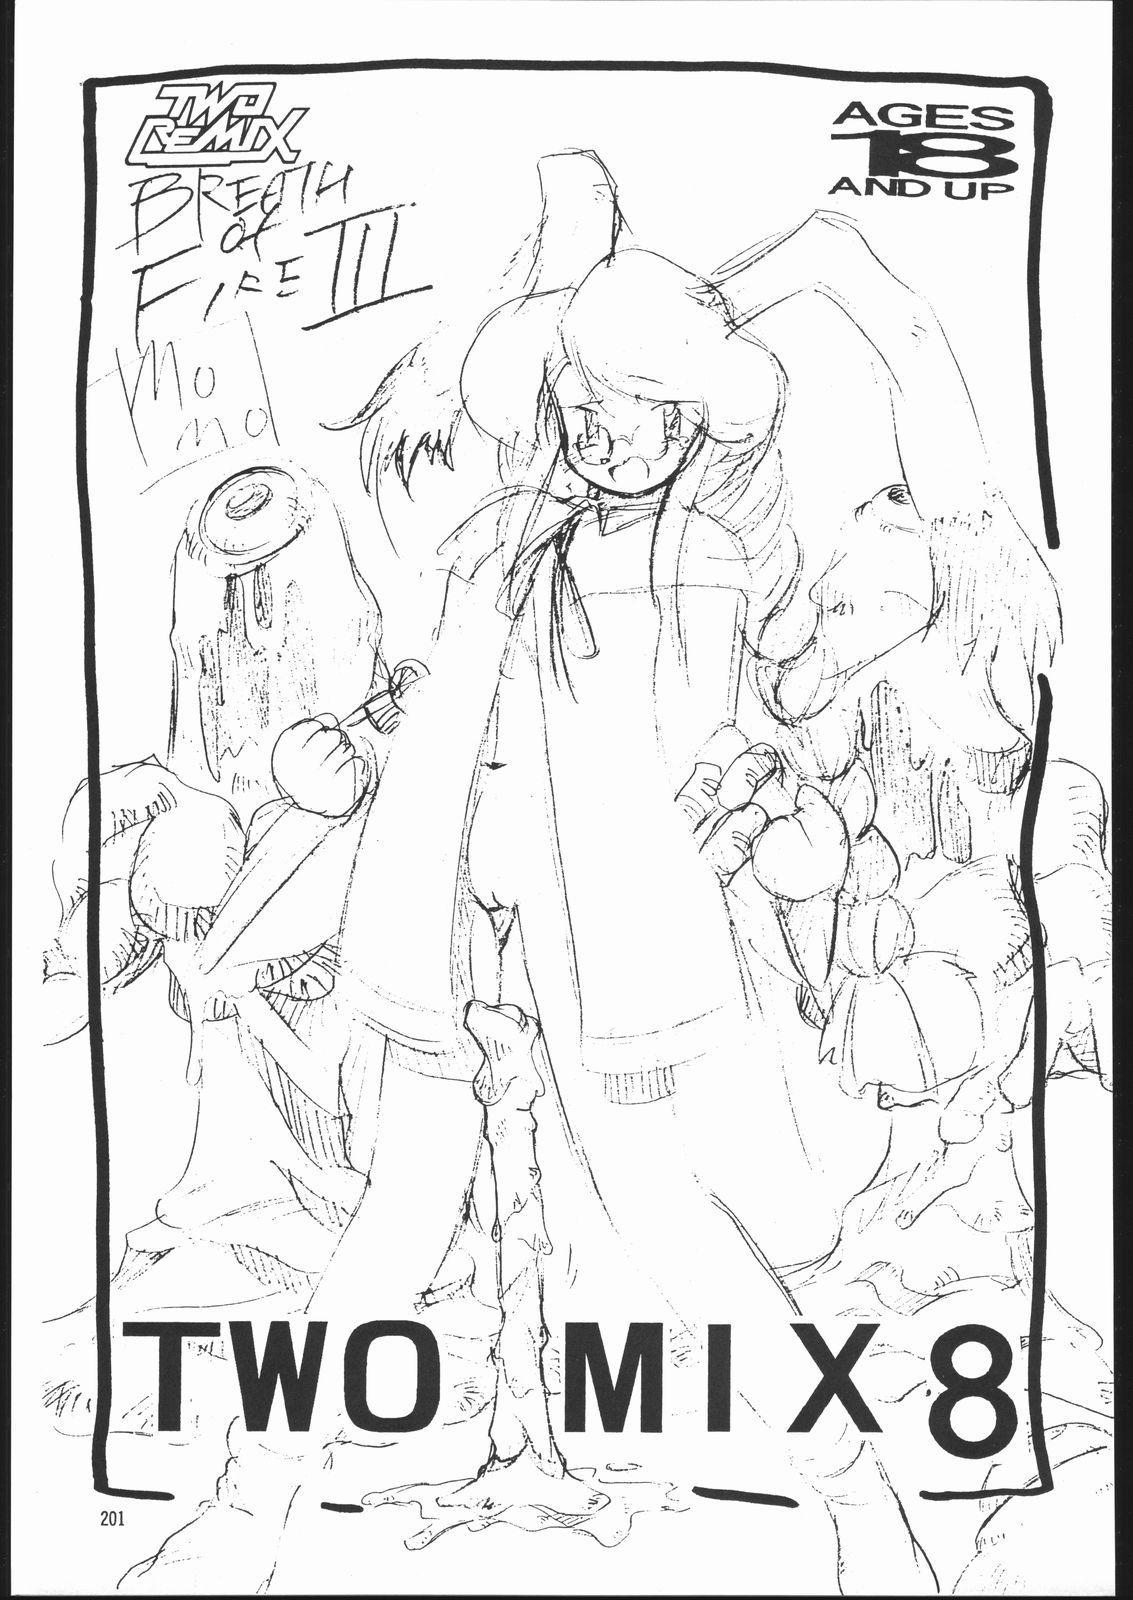 TWO REMIX 199